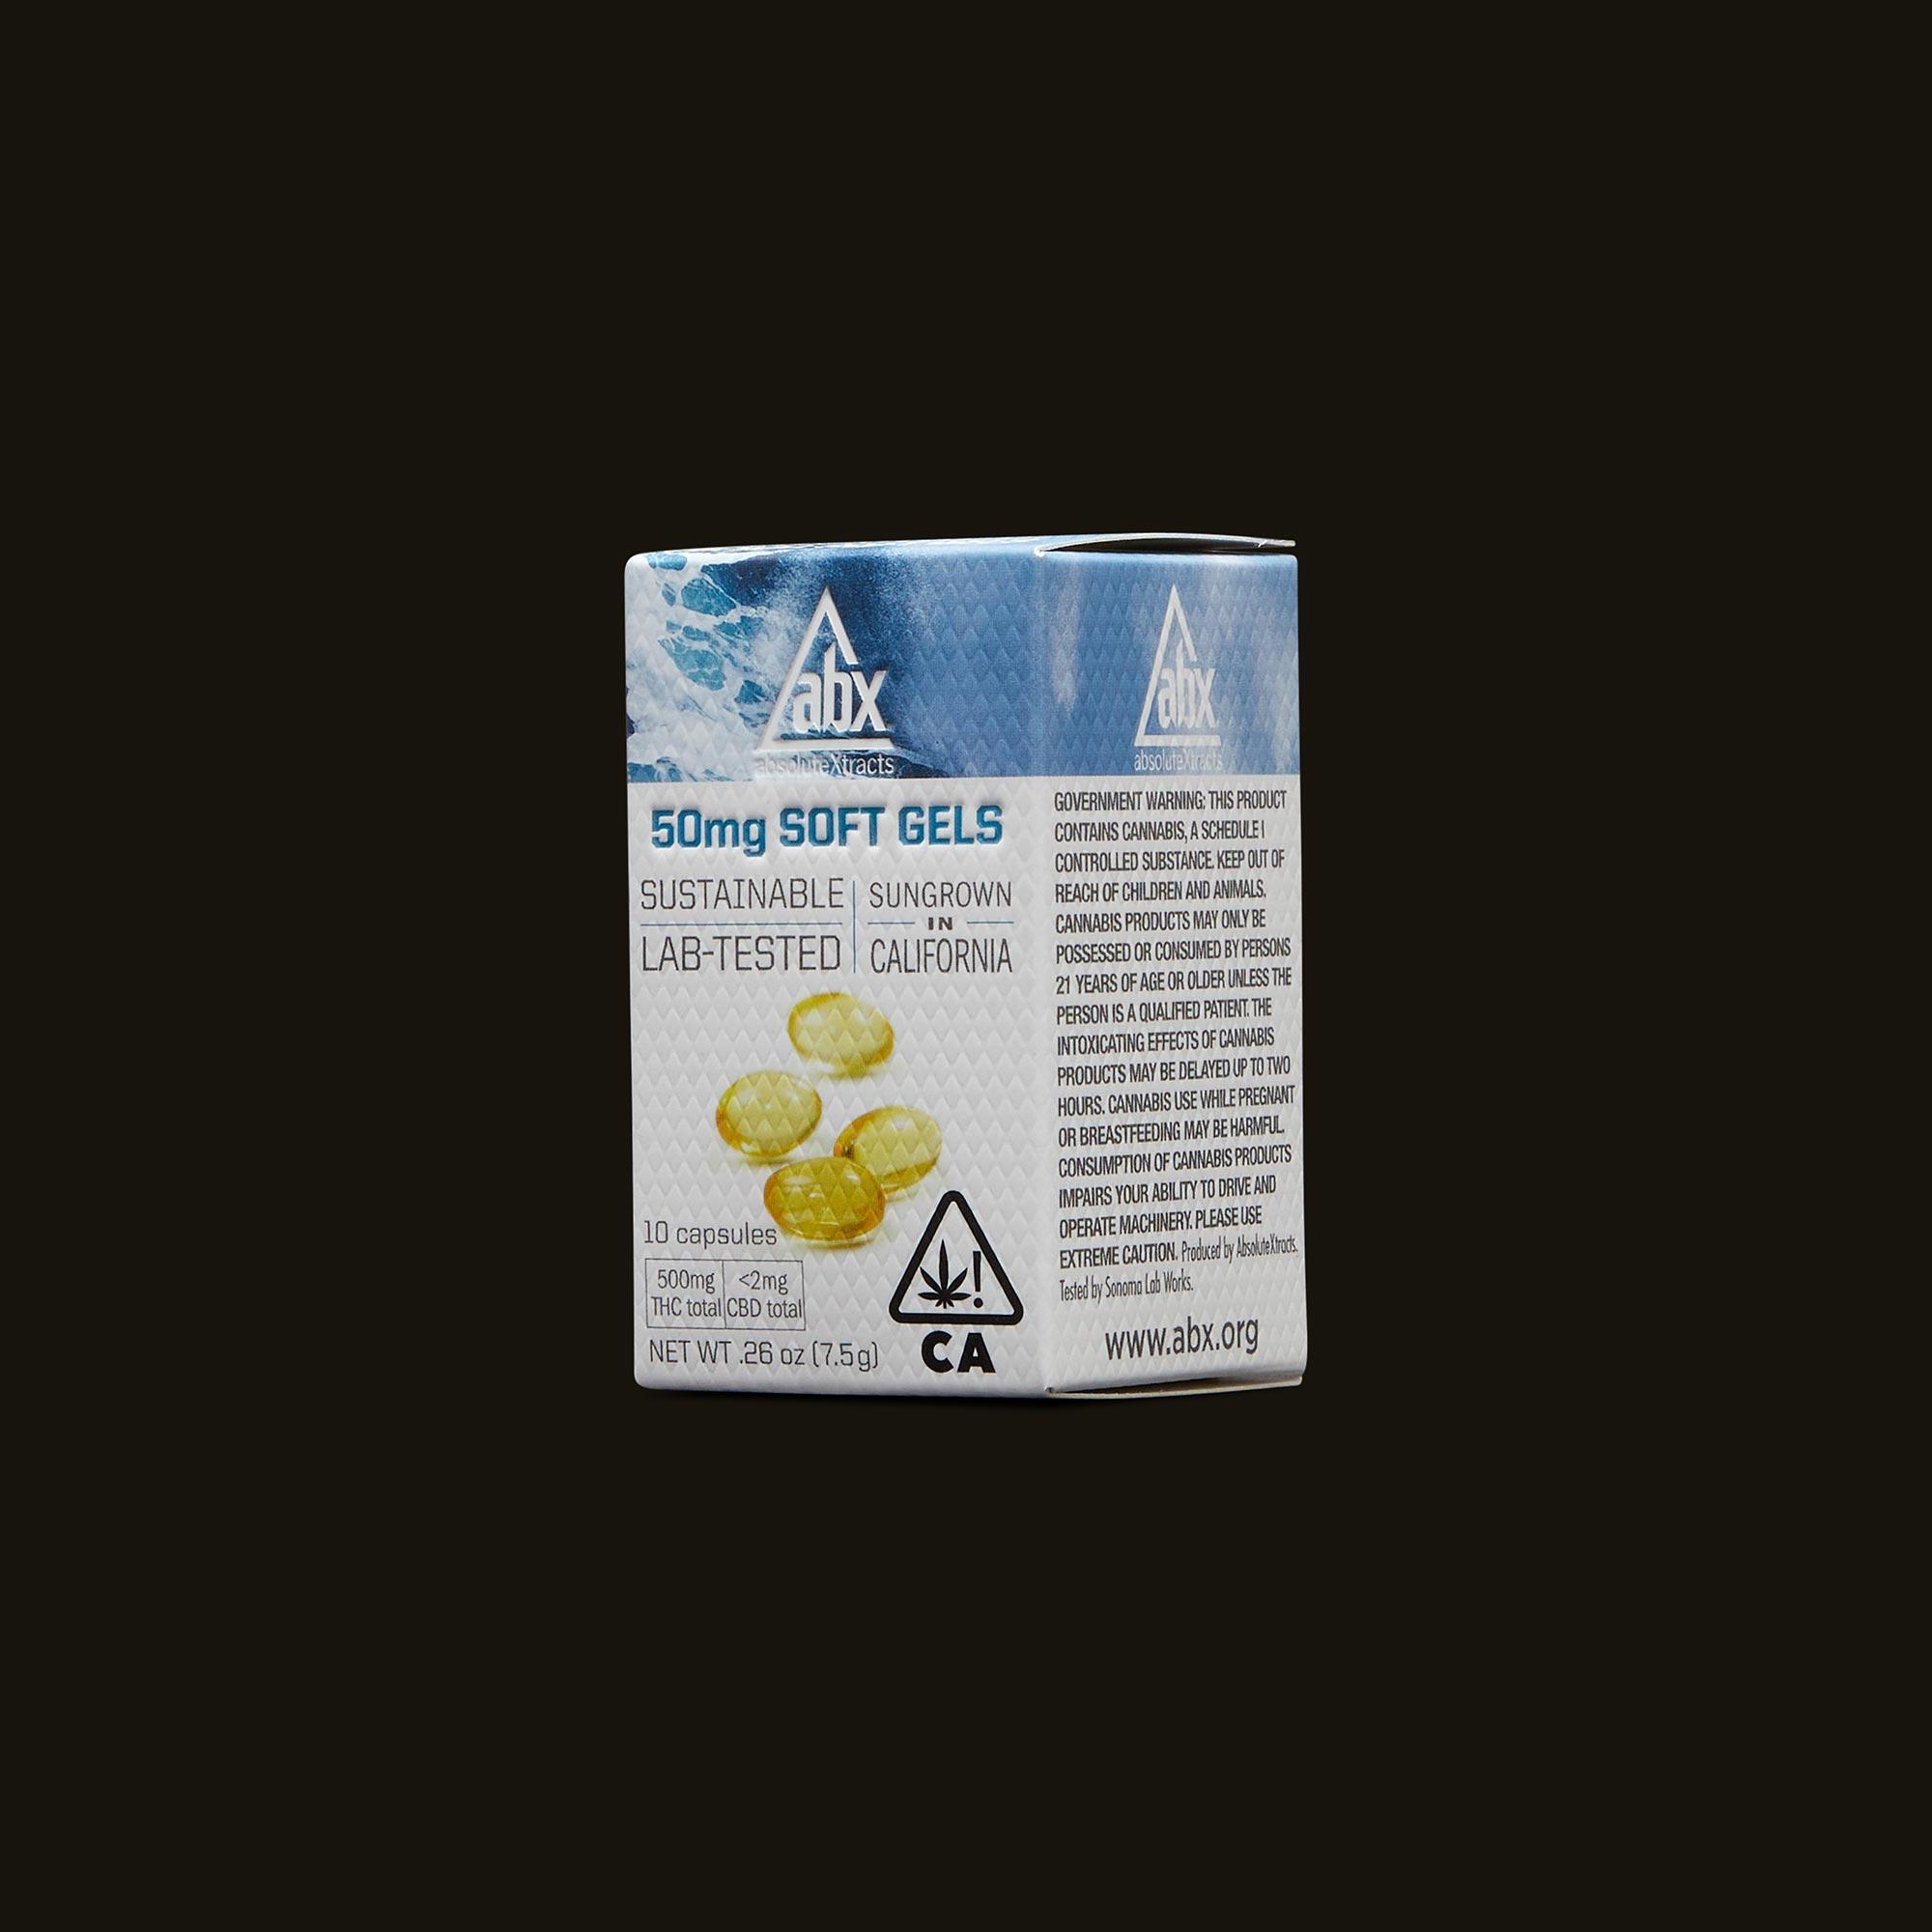 ABX 50mg Soft Gels